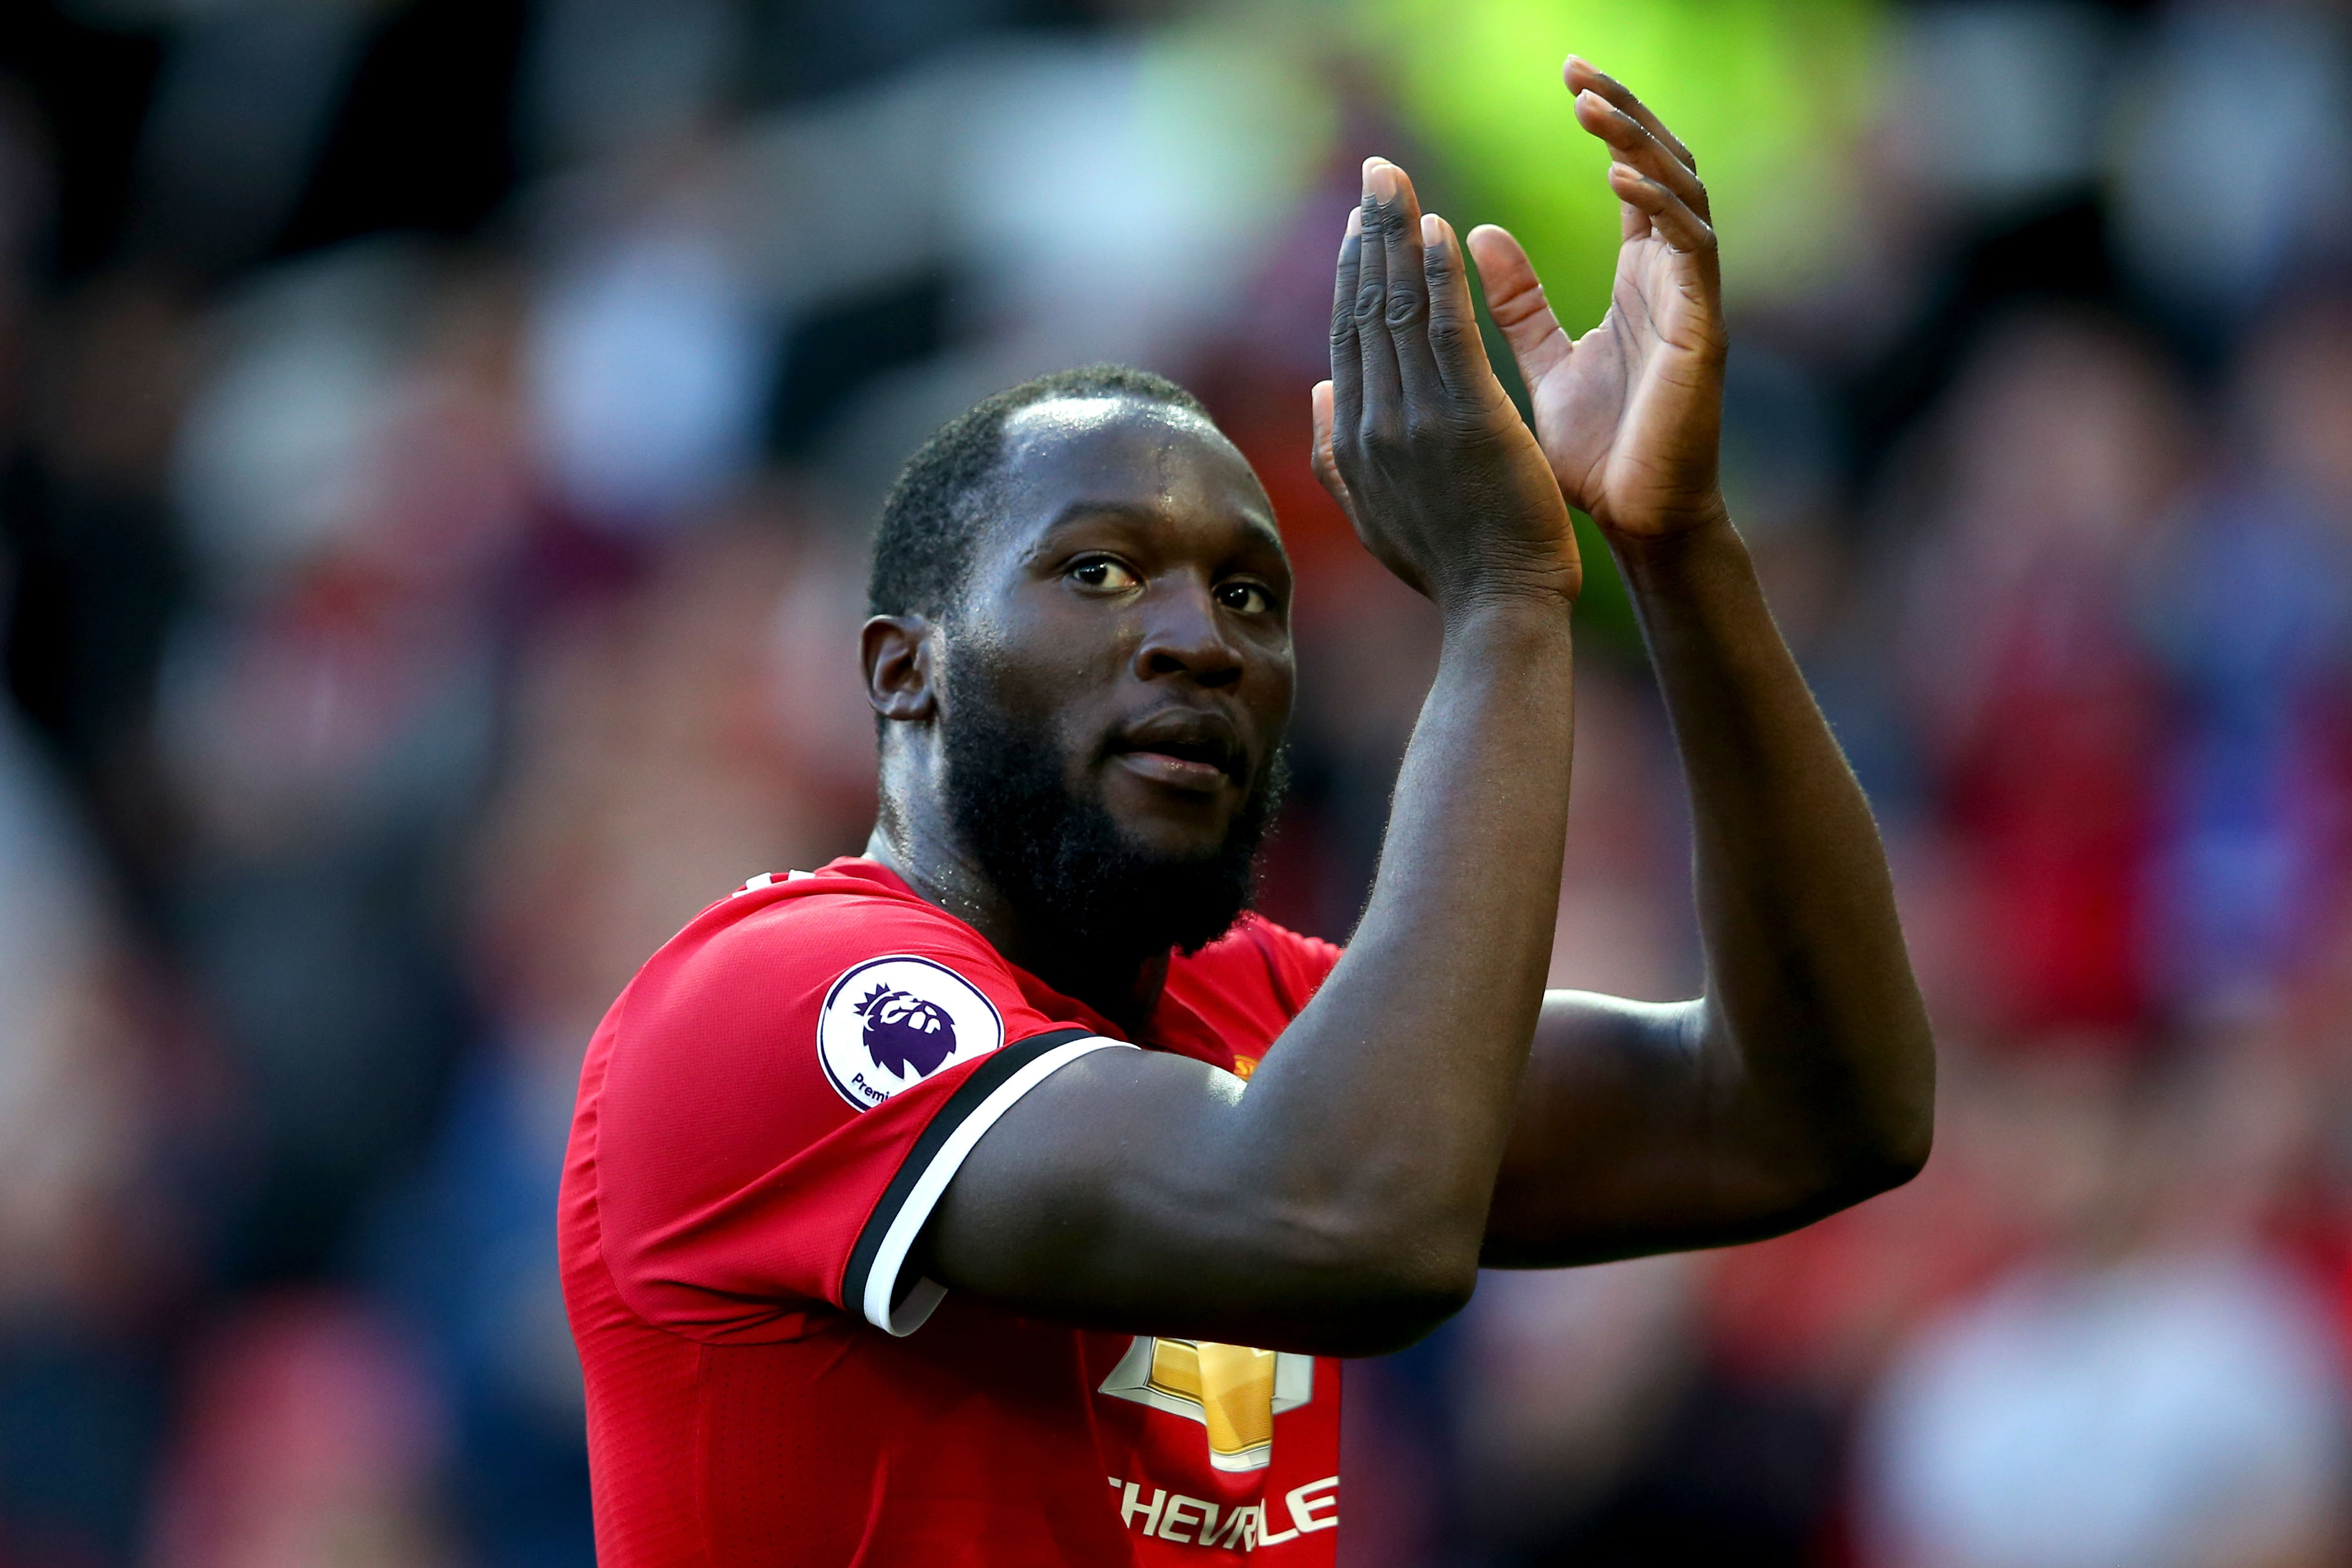 Romelu Lukaku joins elite Manchester United club with goal vs Southampton